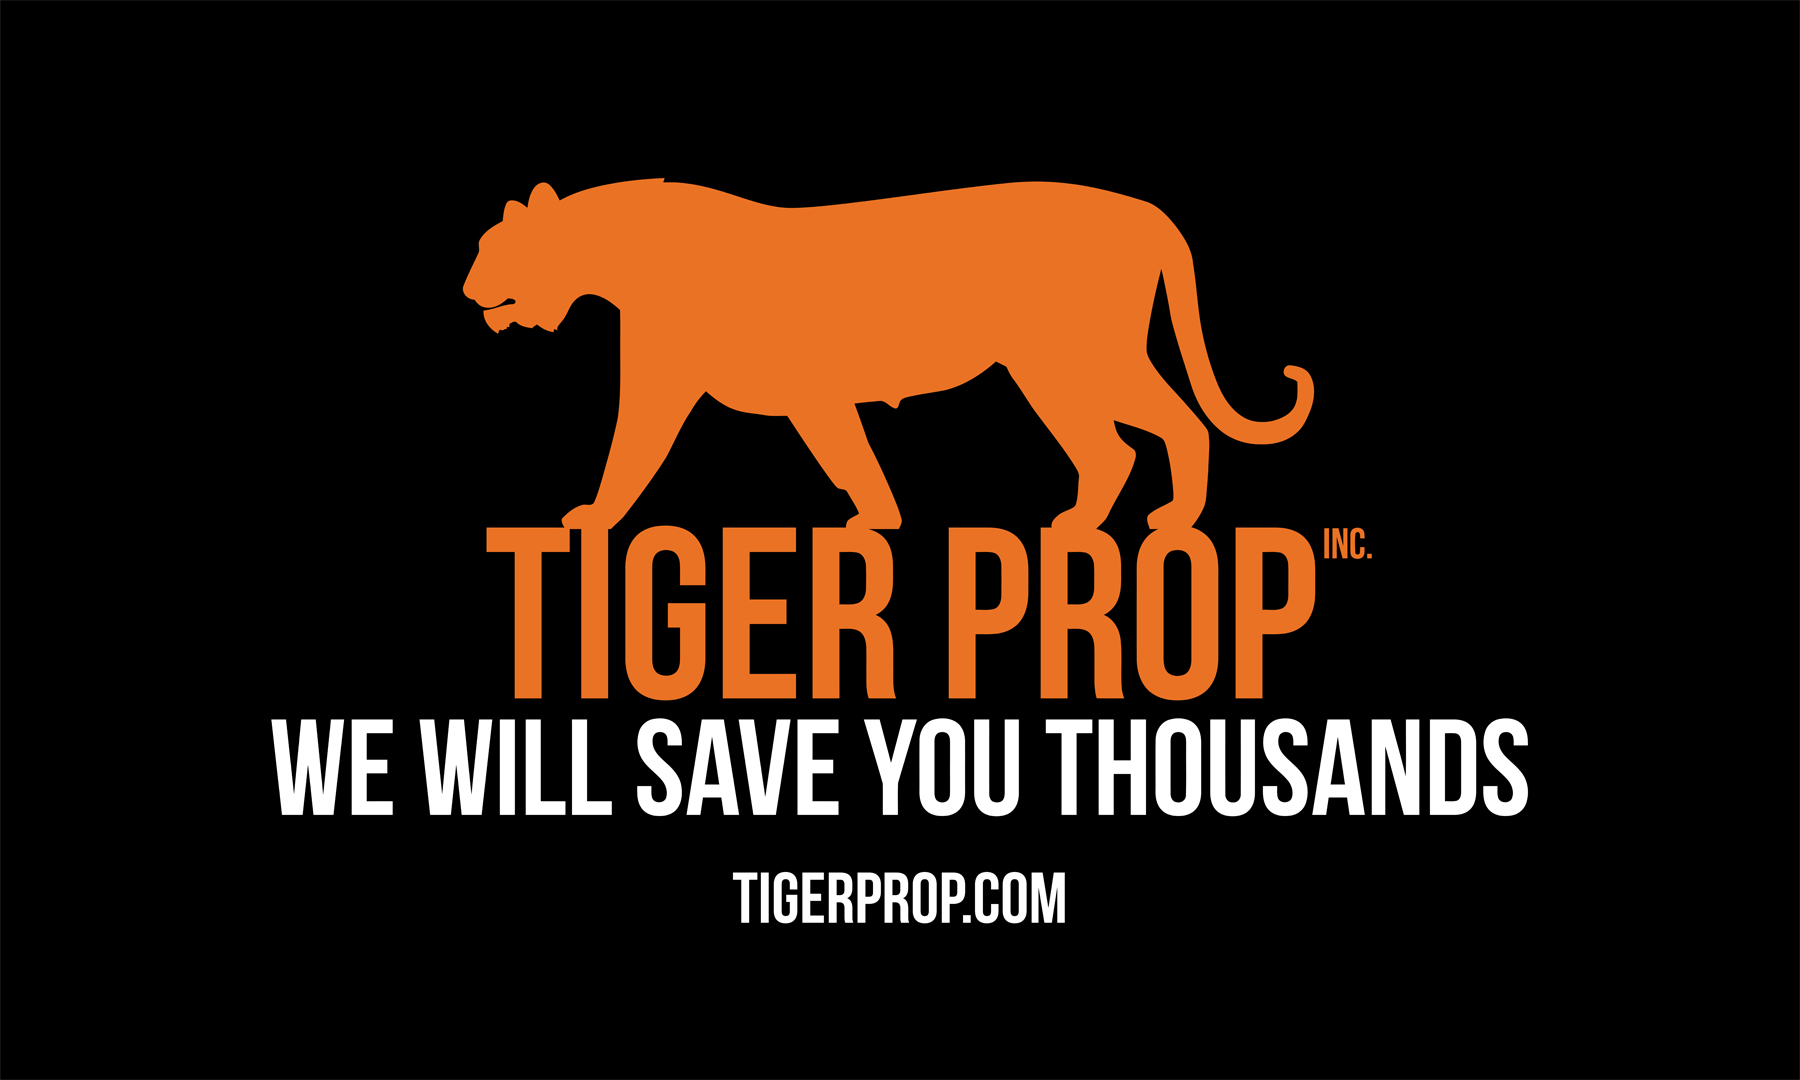 Tiger Prop